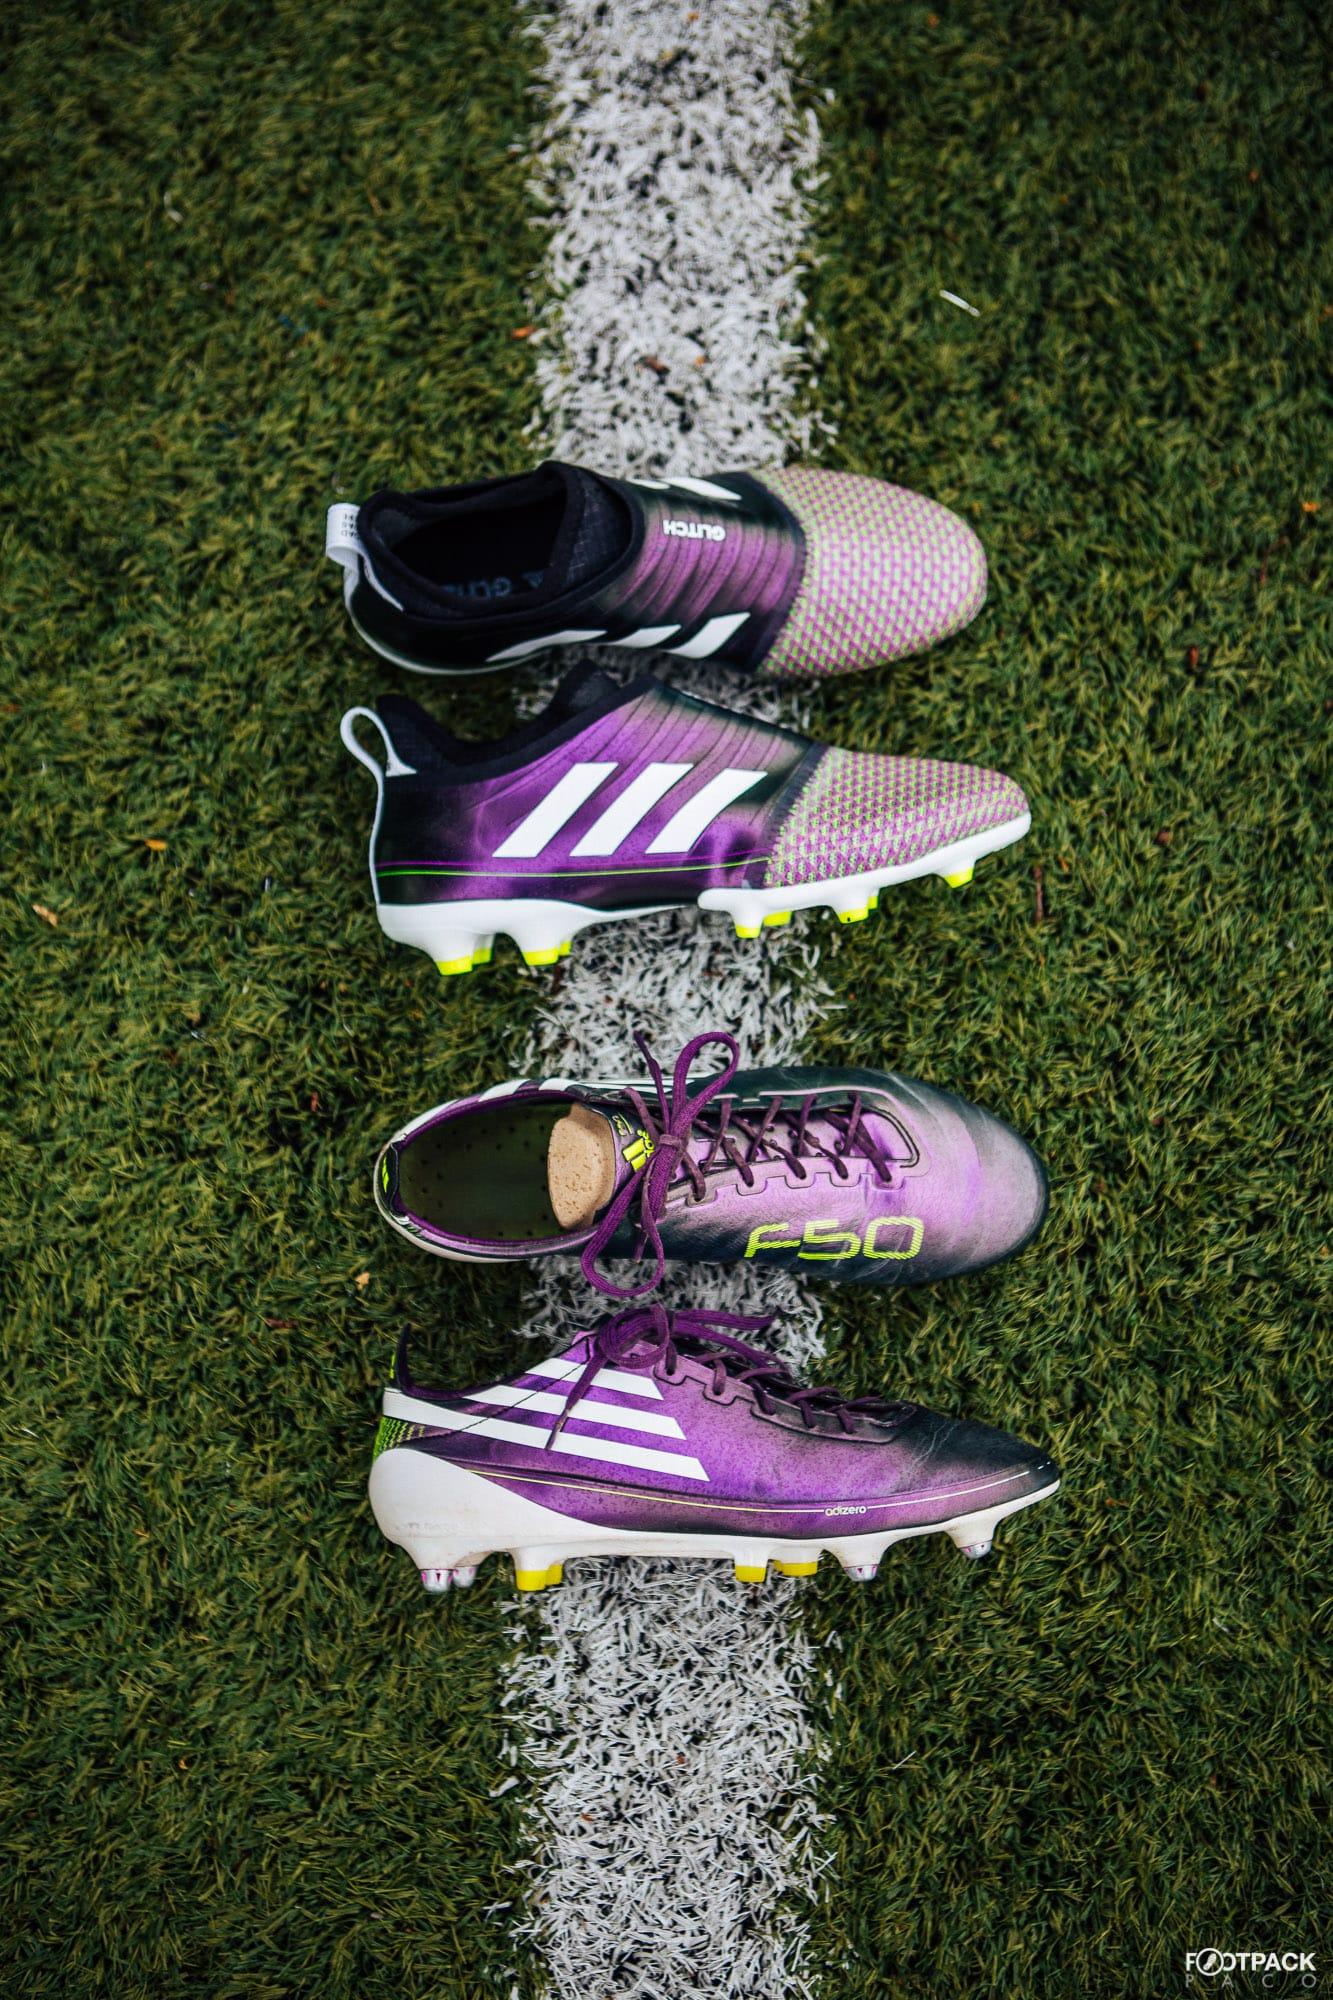 Chaussures-football-adidas-glitch-f50-mai-2018-8